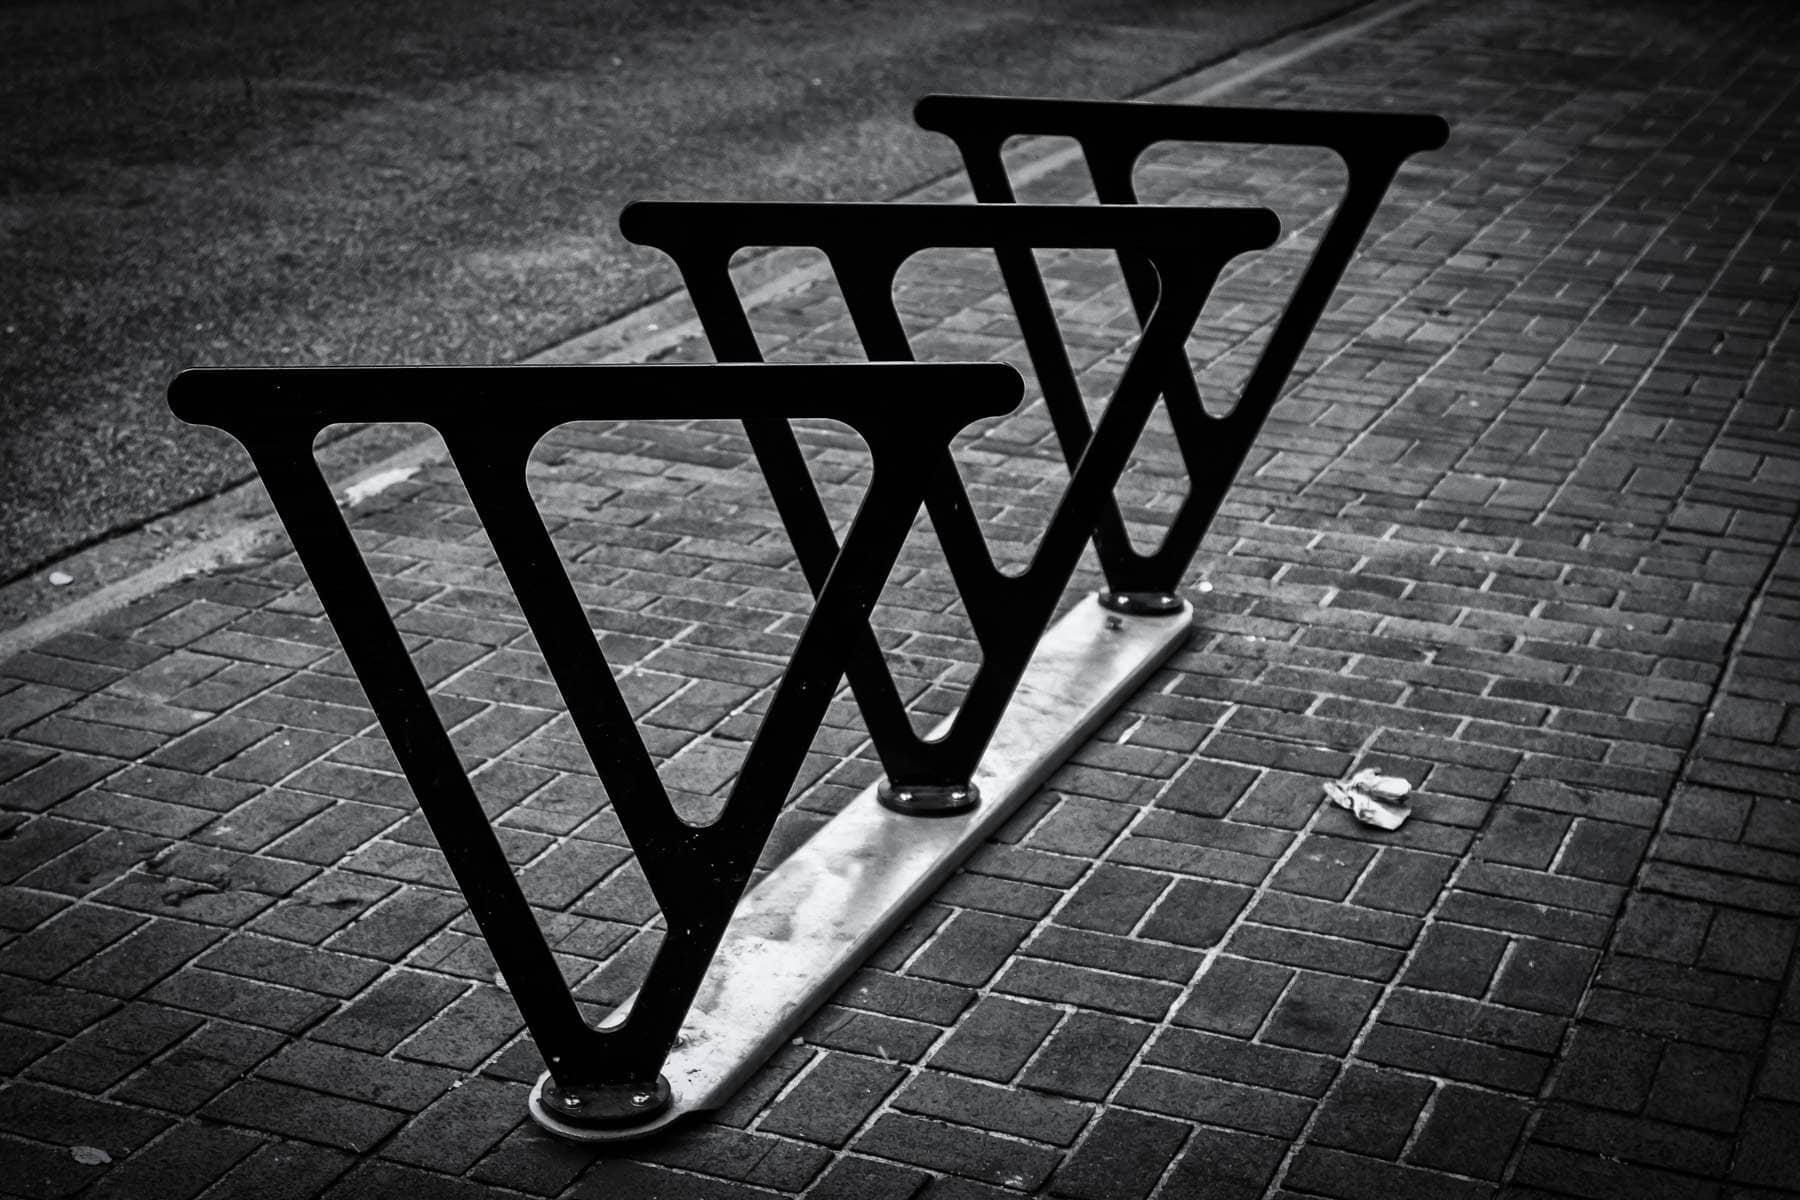 The unique, V-shaped bike racks of Victoria, British Columbia.